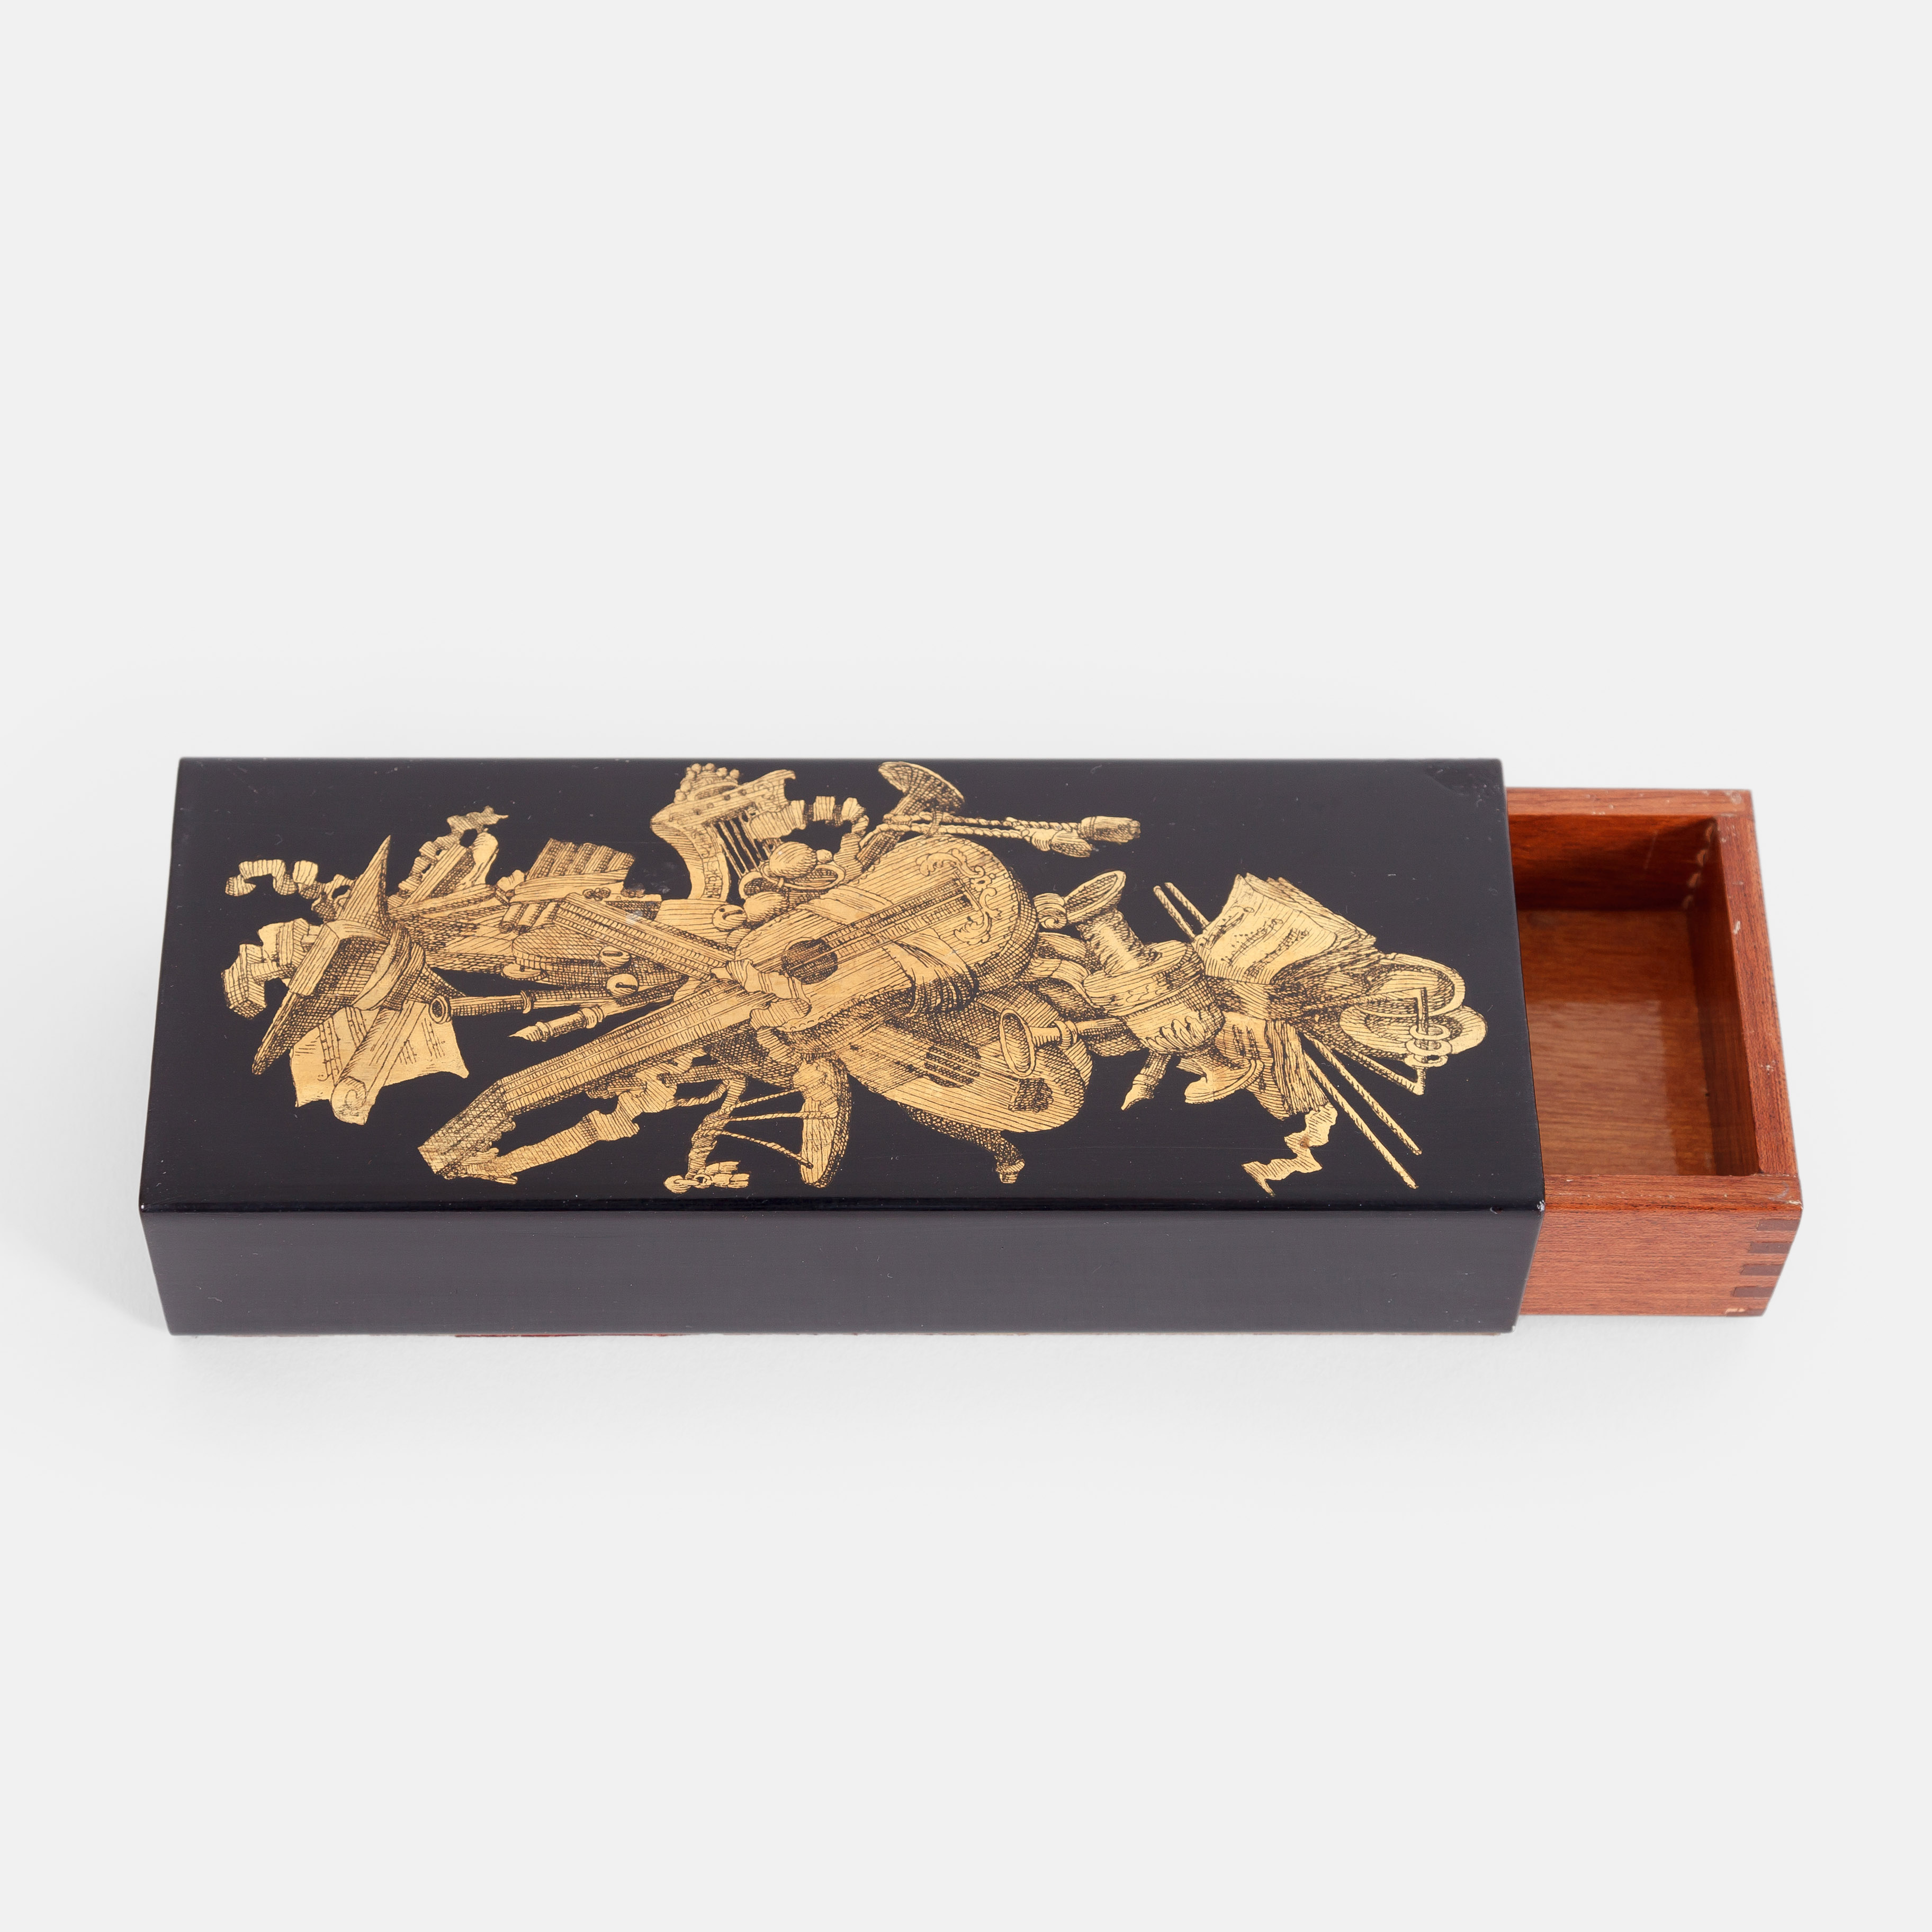 'Trofei Musica' Box by Piero Fornasetti | soyun k.